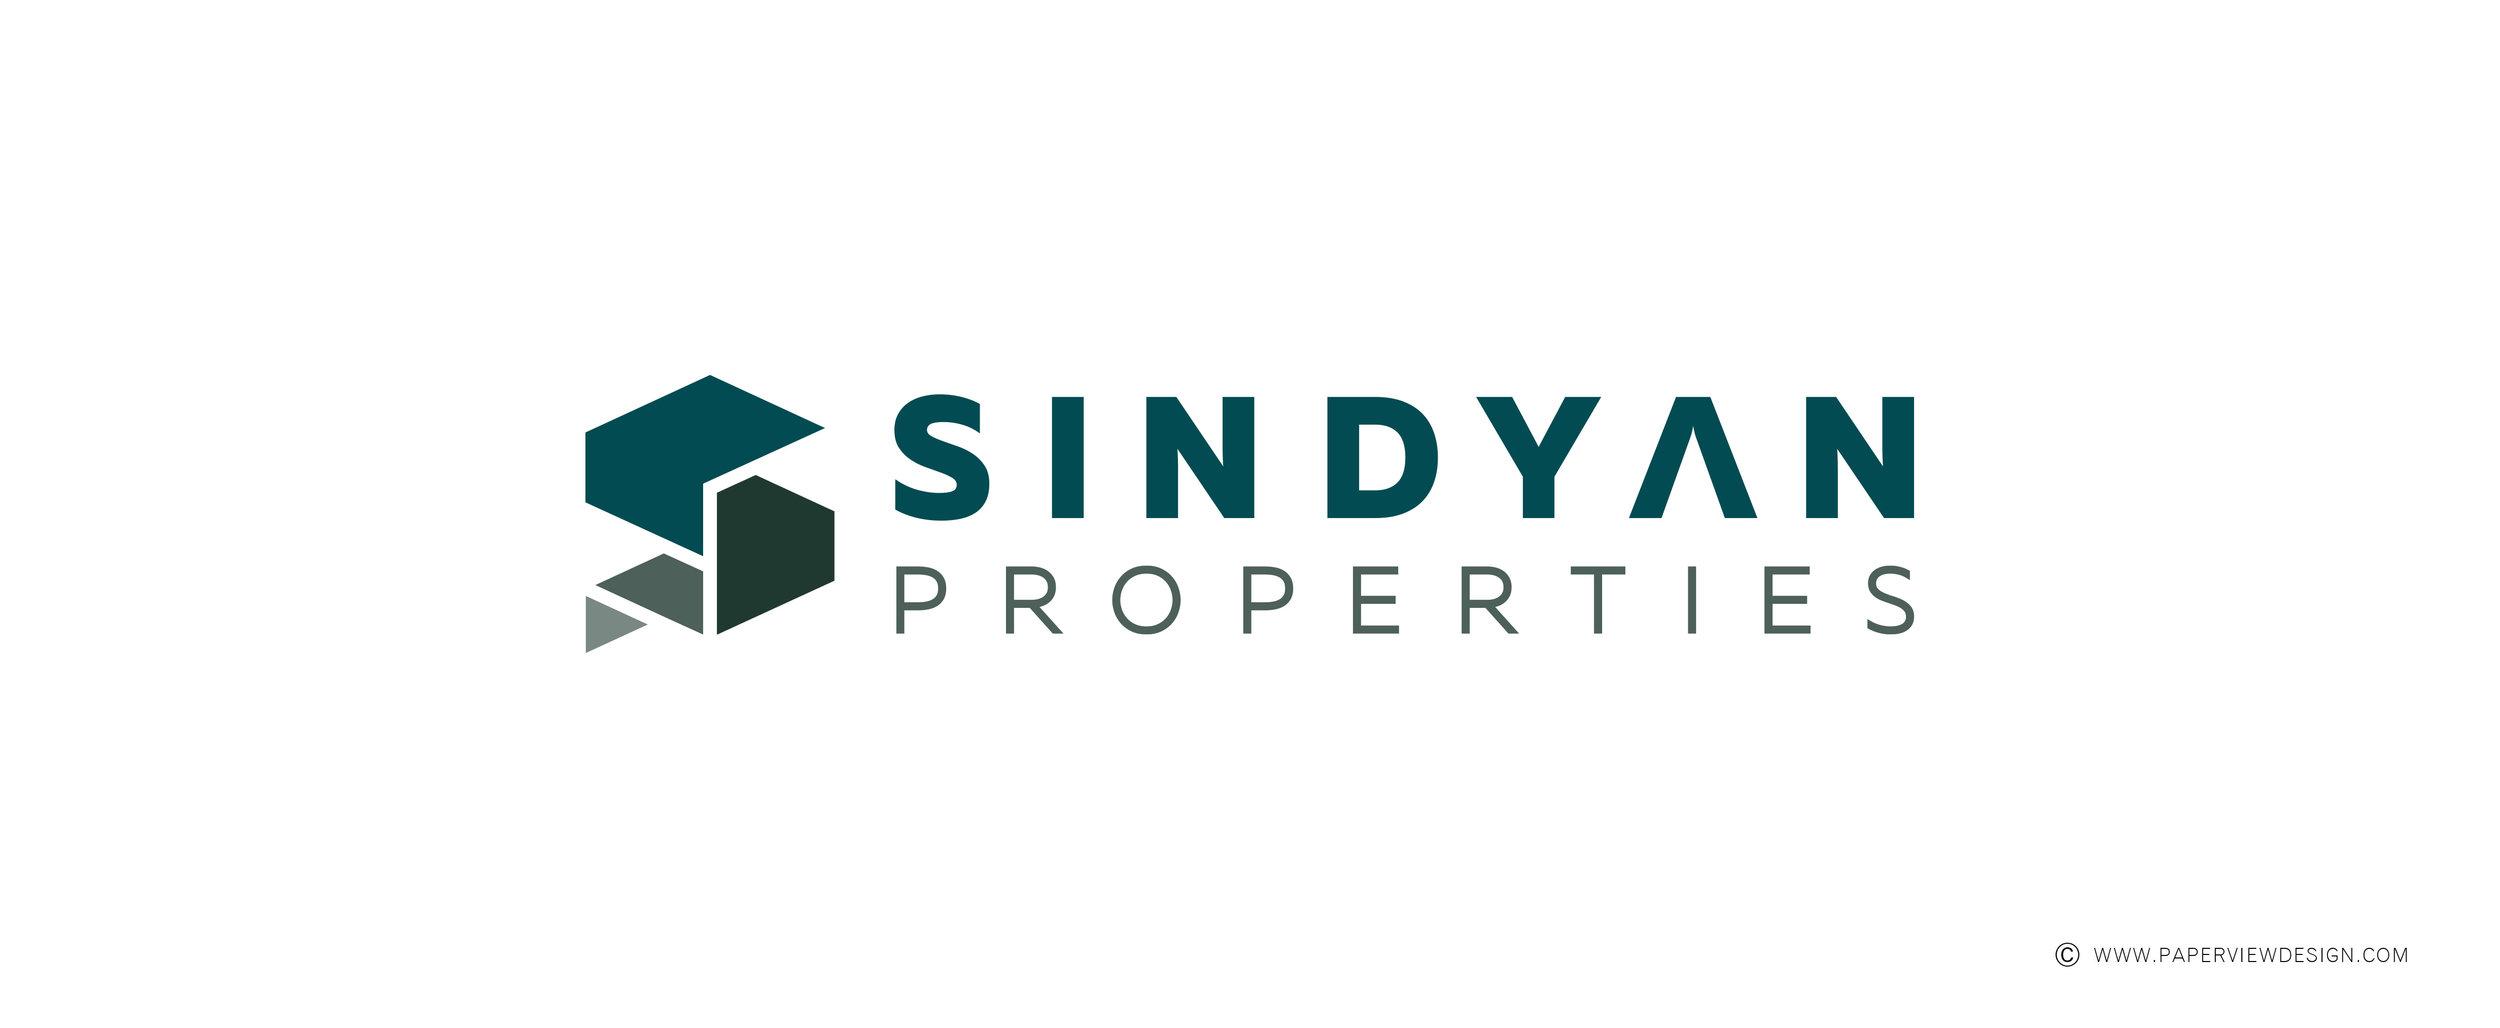 SindiyanProperties-logo-website.jpg